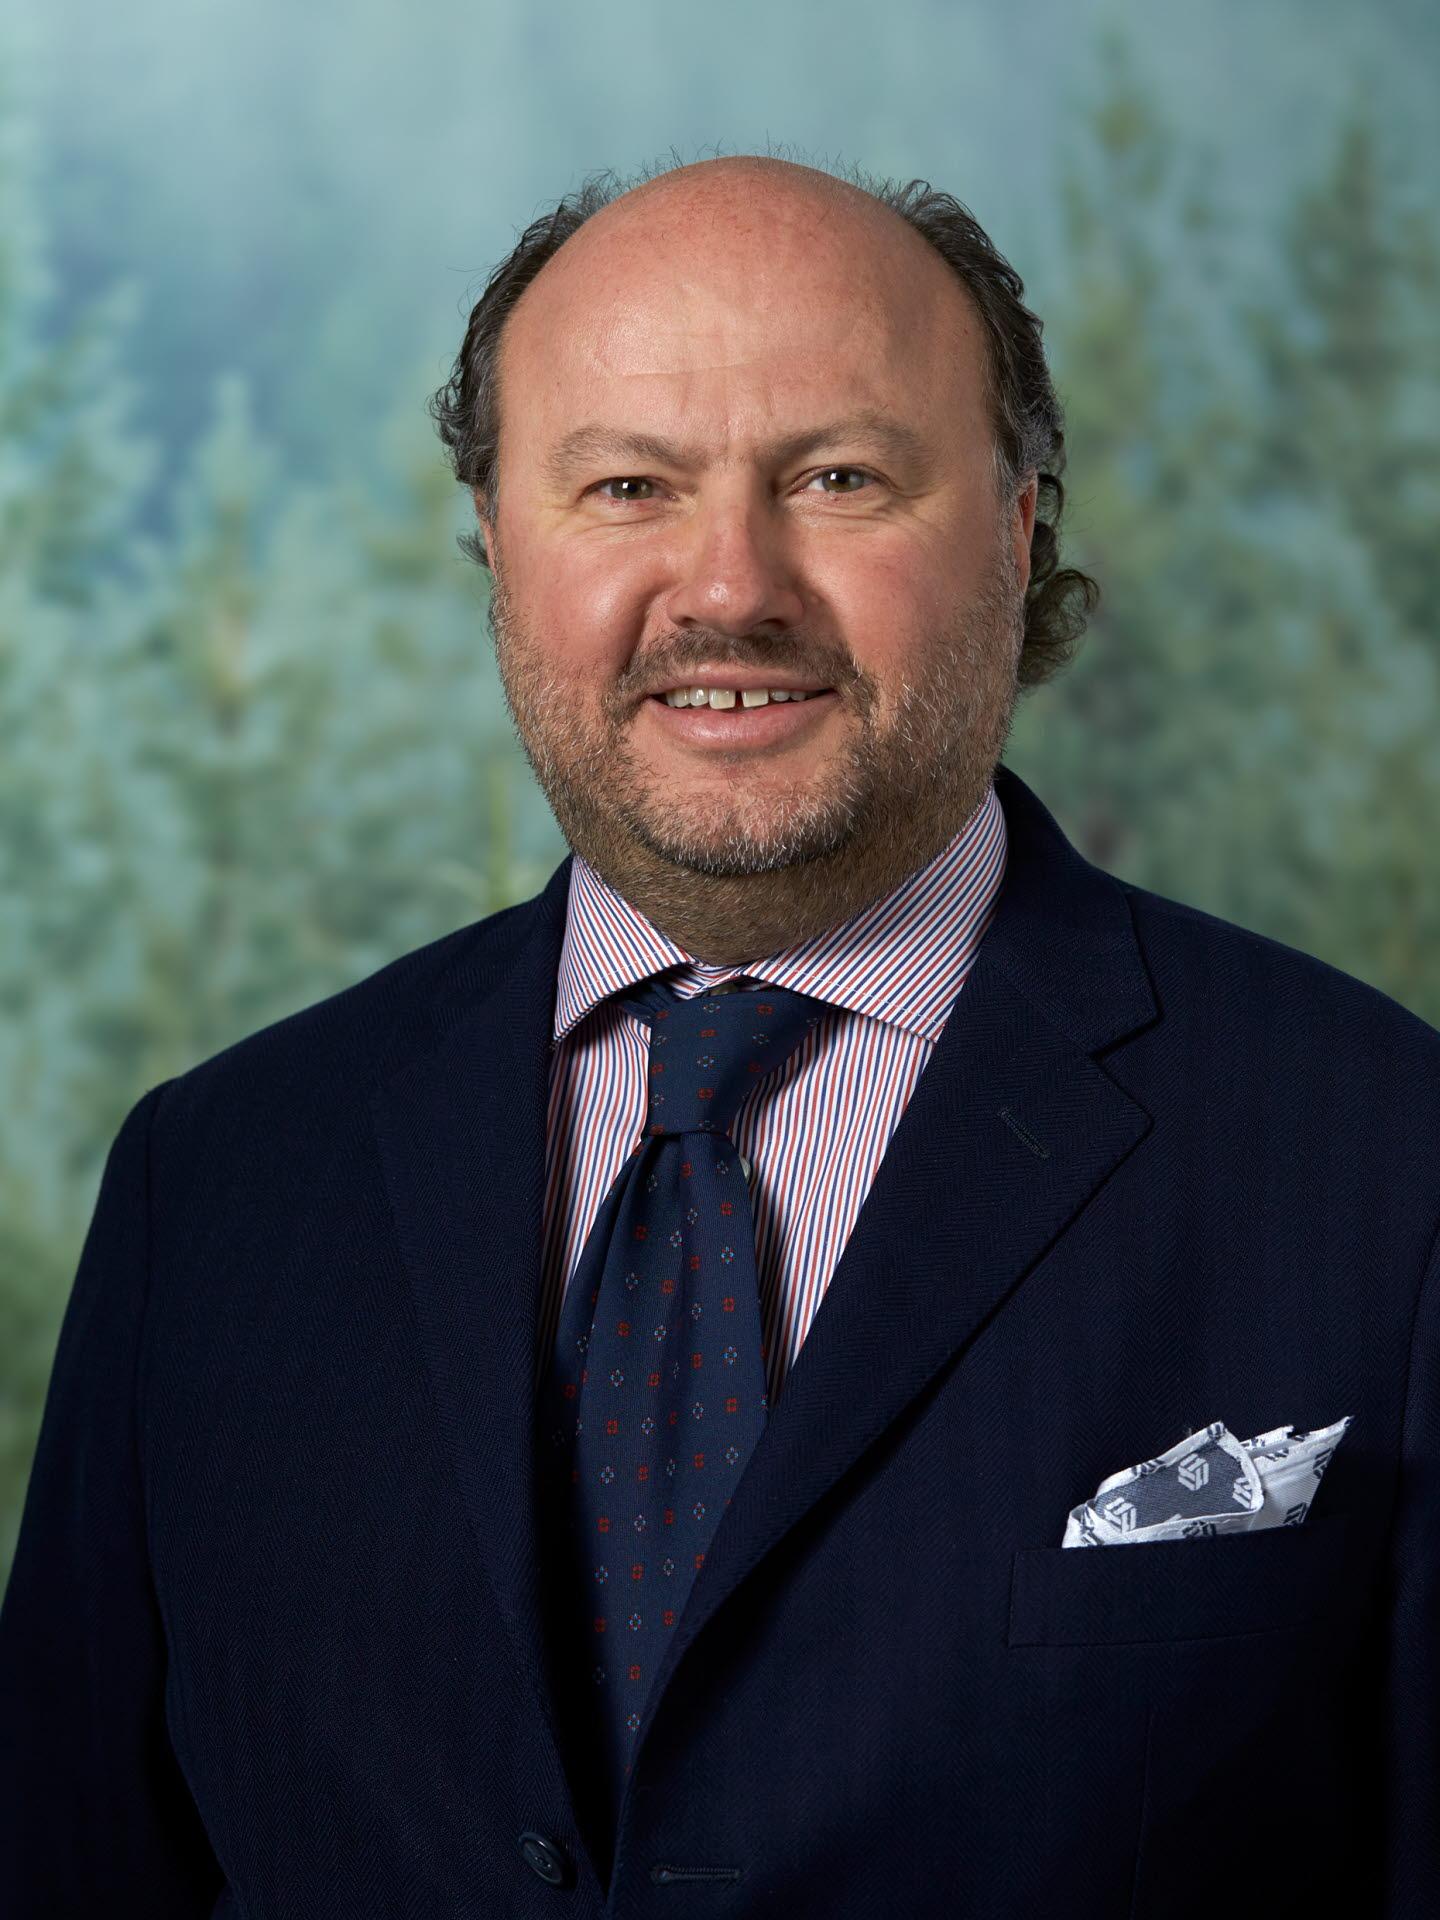 Raffaele Parlato